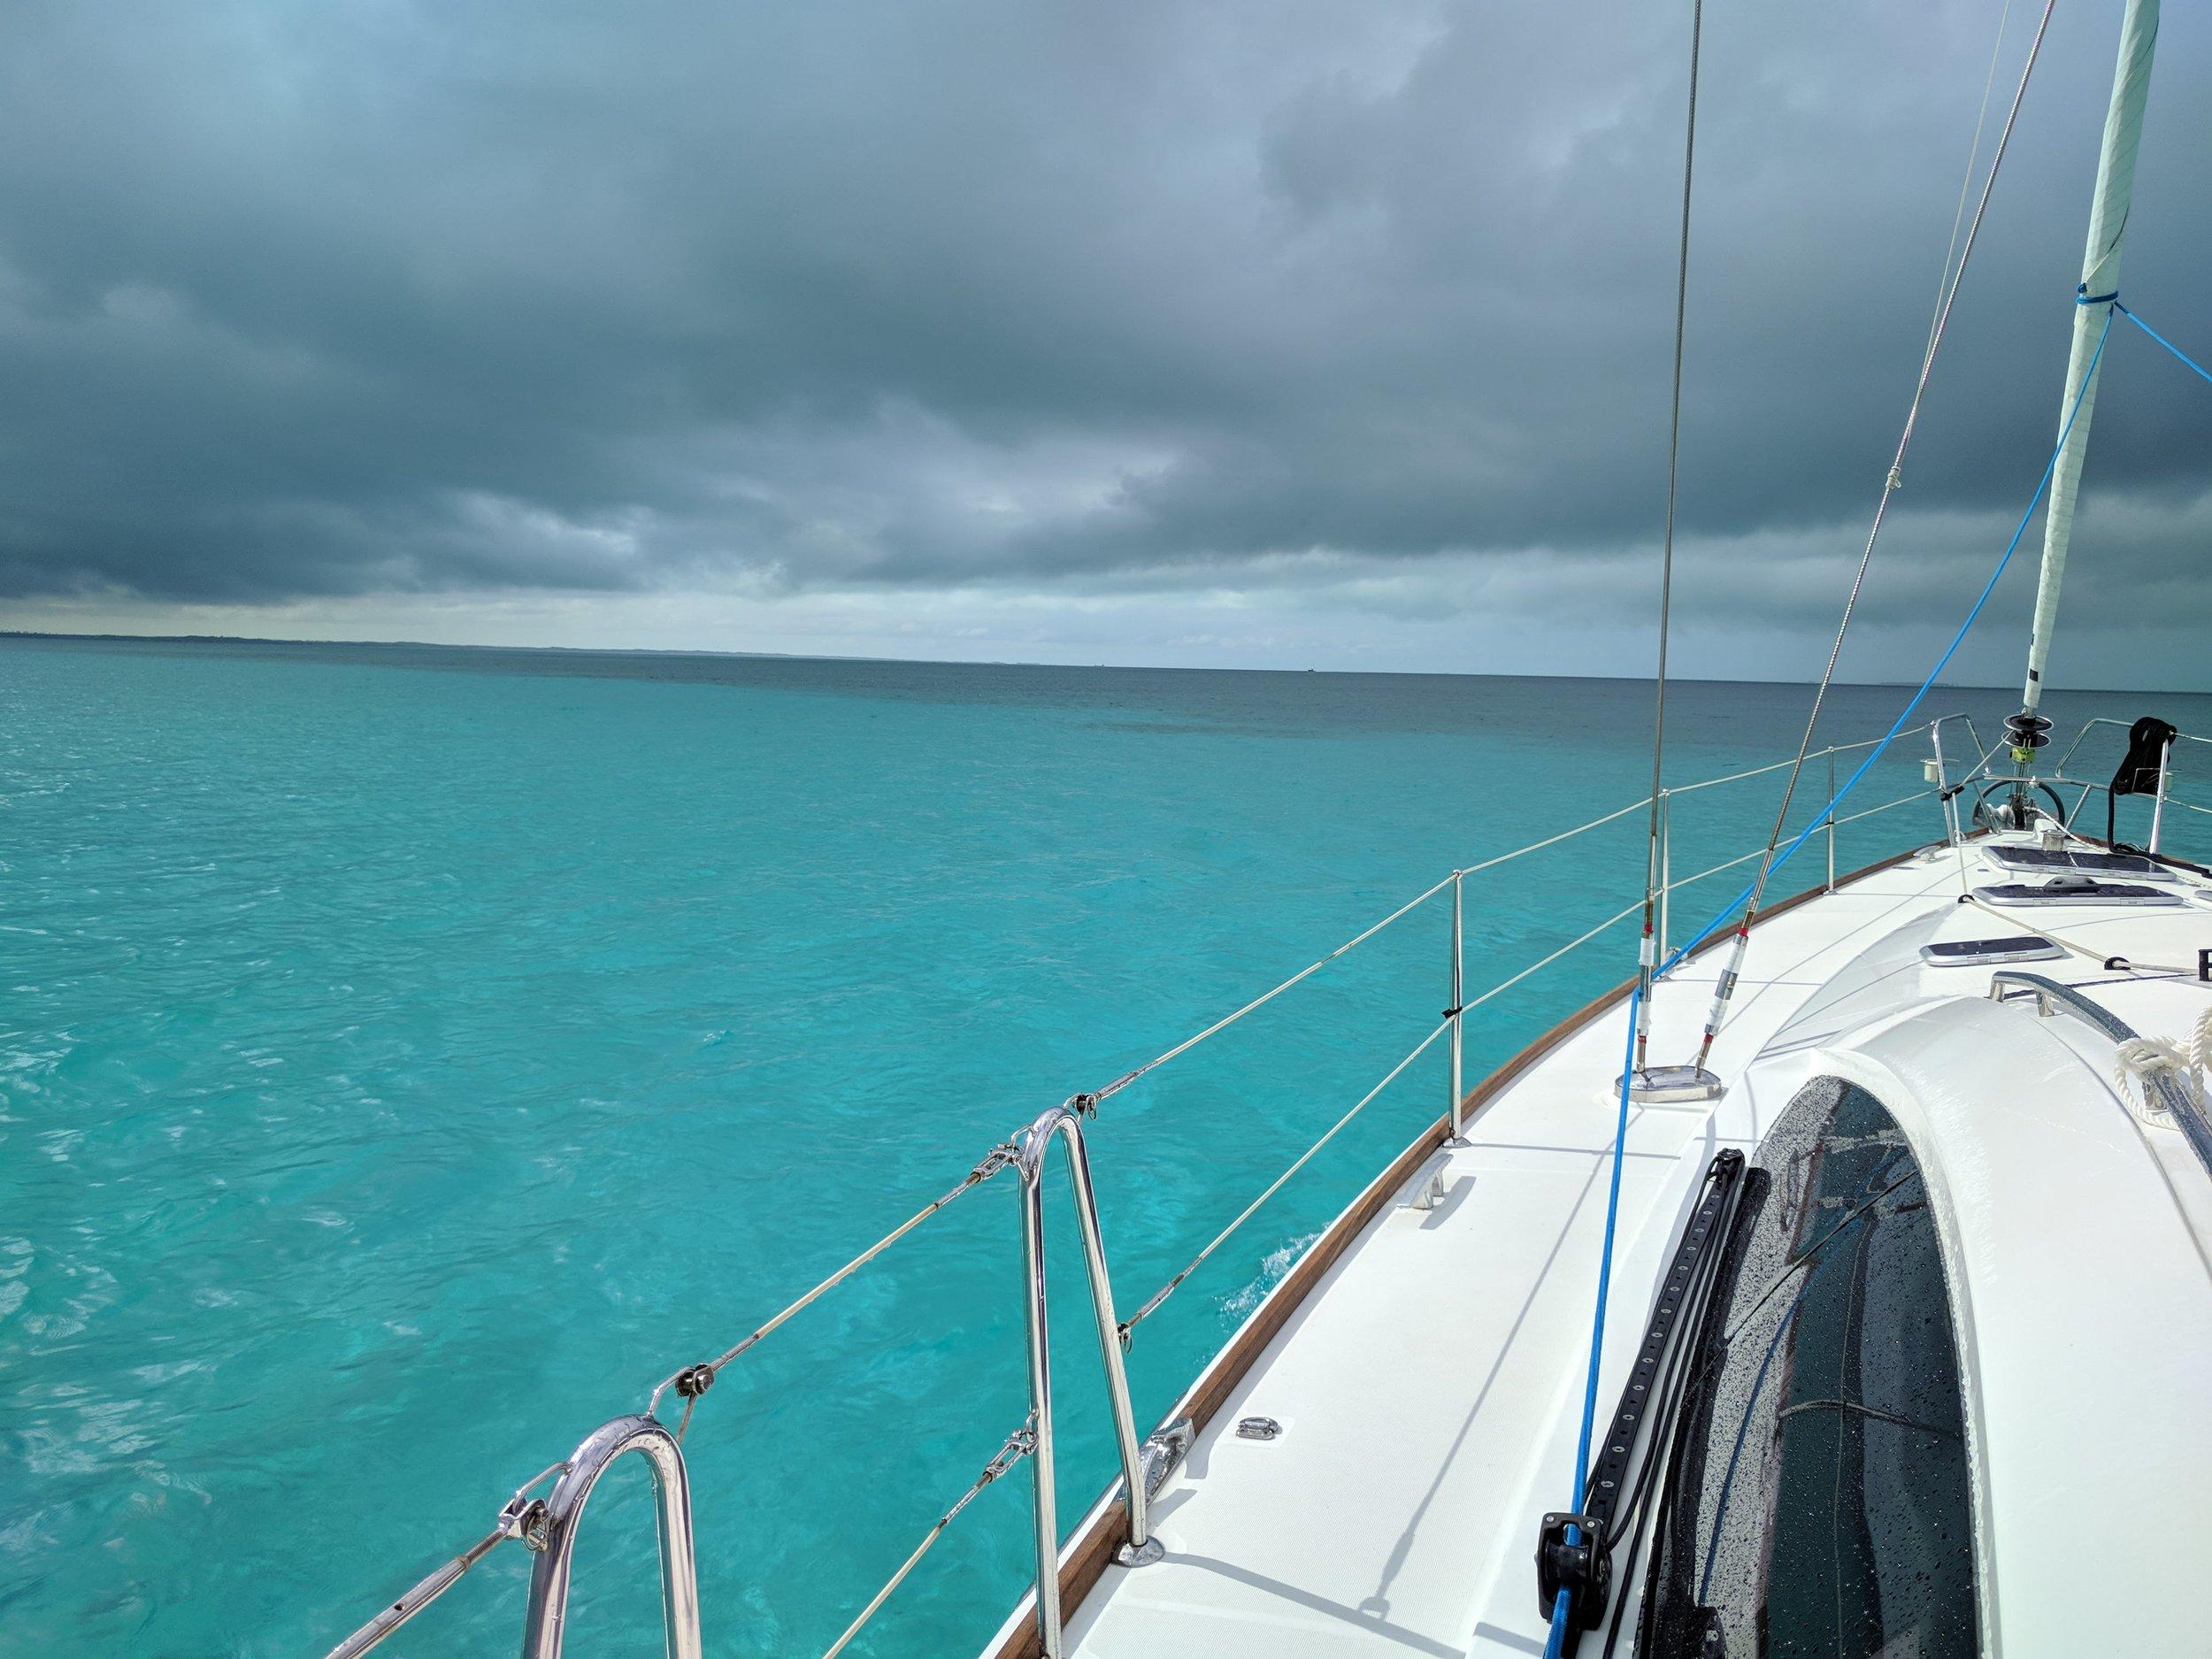 Heading back to Treasure Cay ahead of the storm.